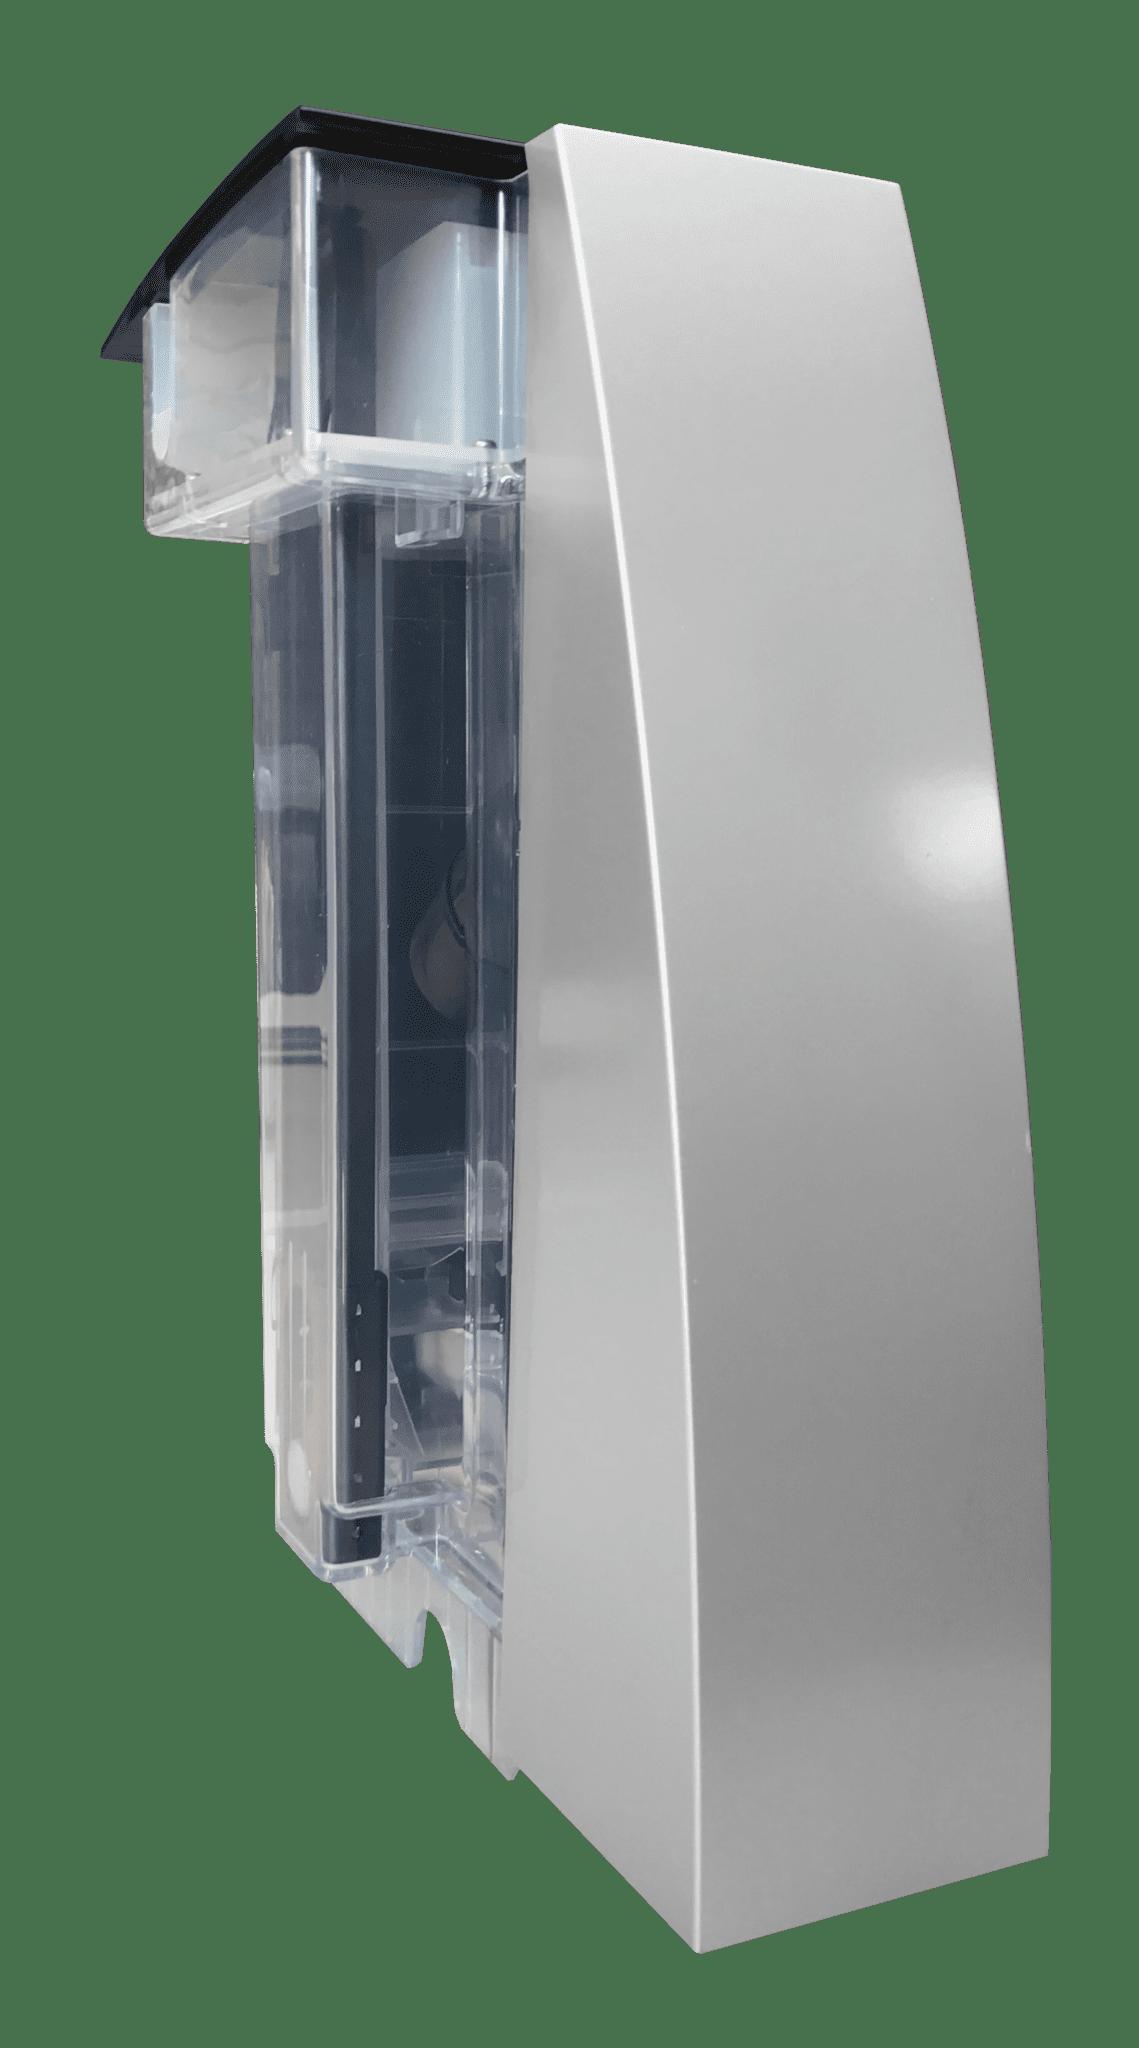 Keurig Direct Water Line Plumb Kit for Water Filter Connection K155 B150 B155 K150